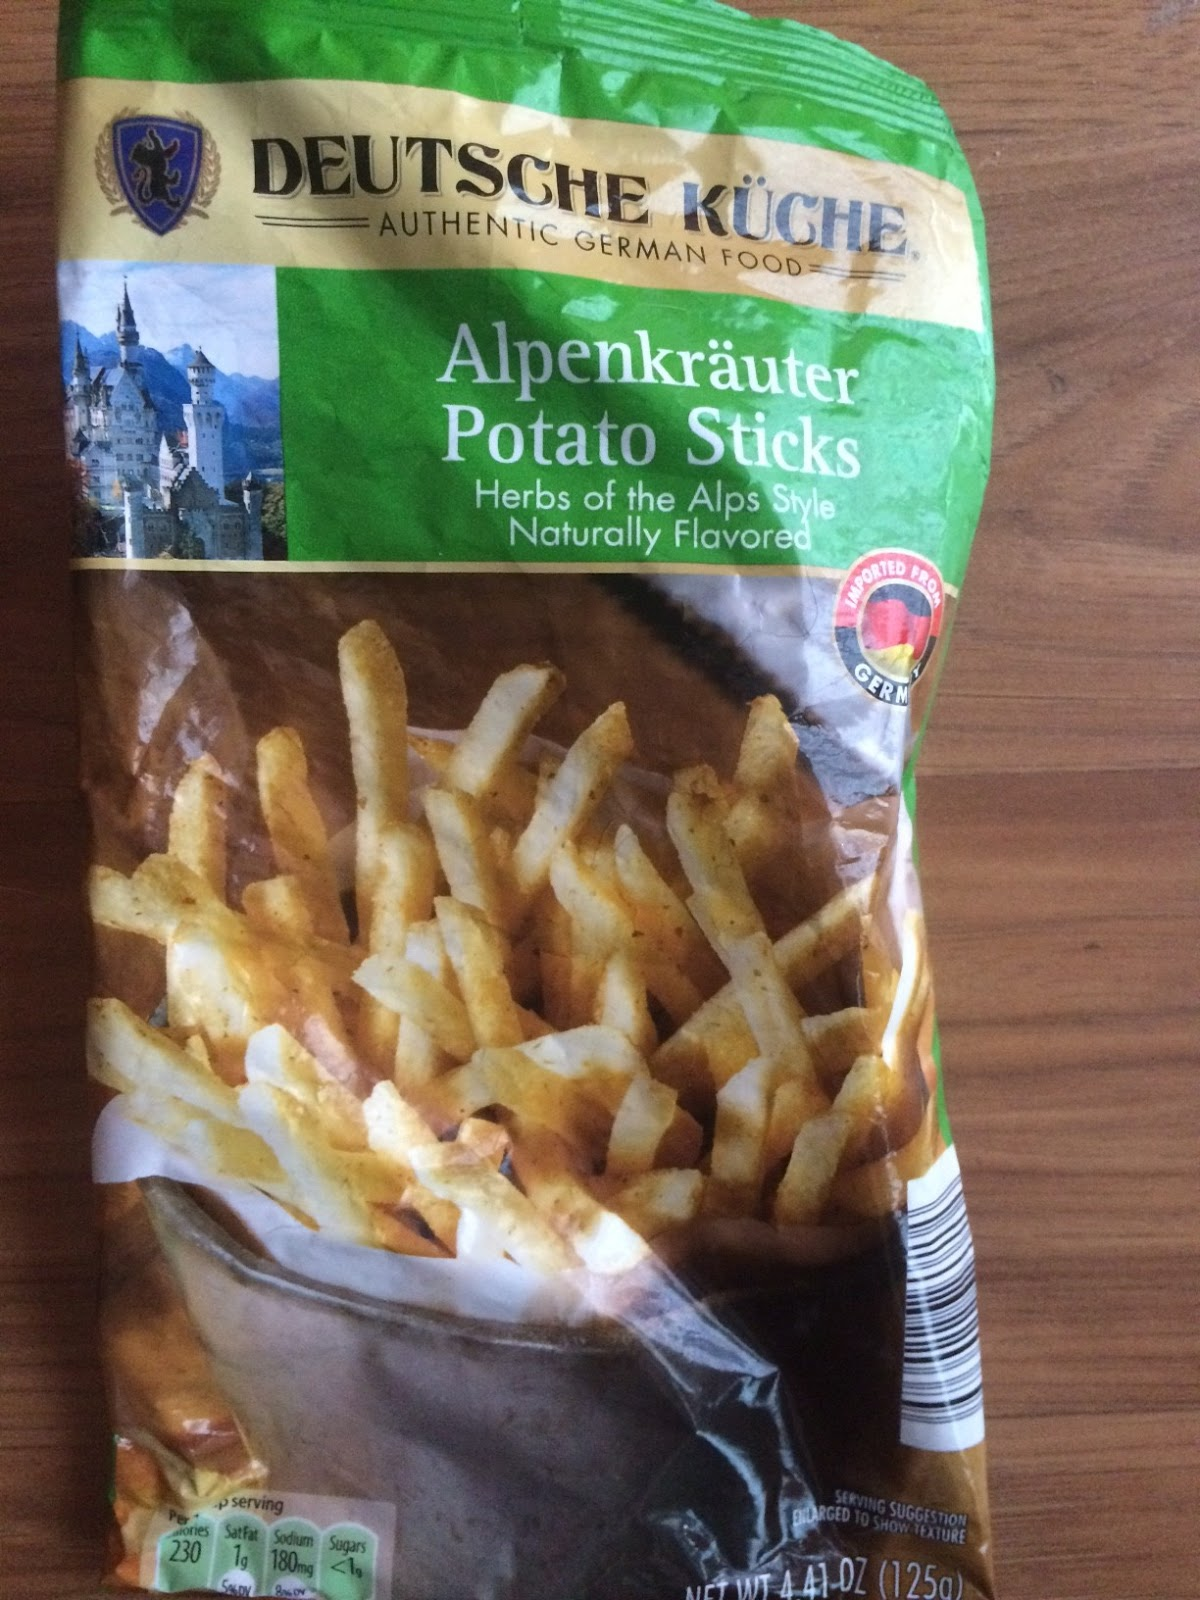 Budget Food Review Deutsche Kuche Reiberdatschi and Alpenkrauter Potato Sticks Aldi